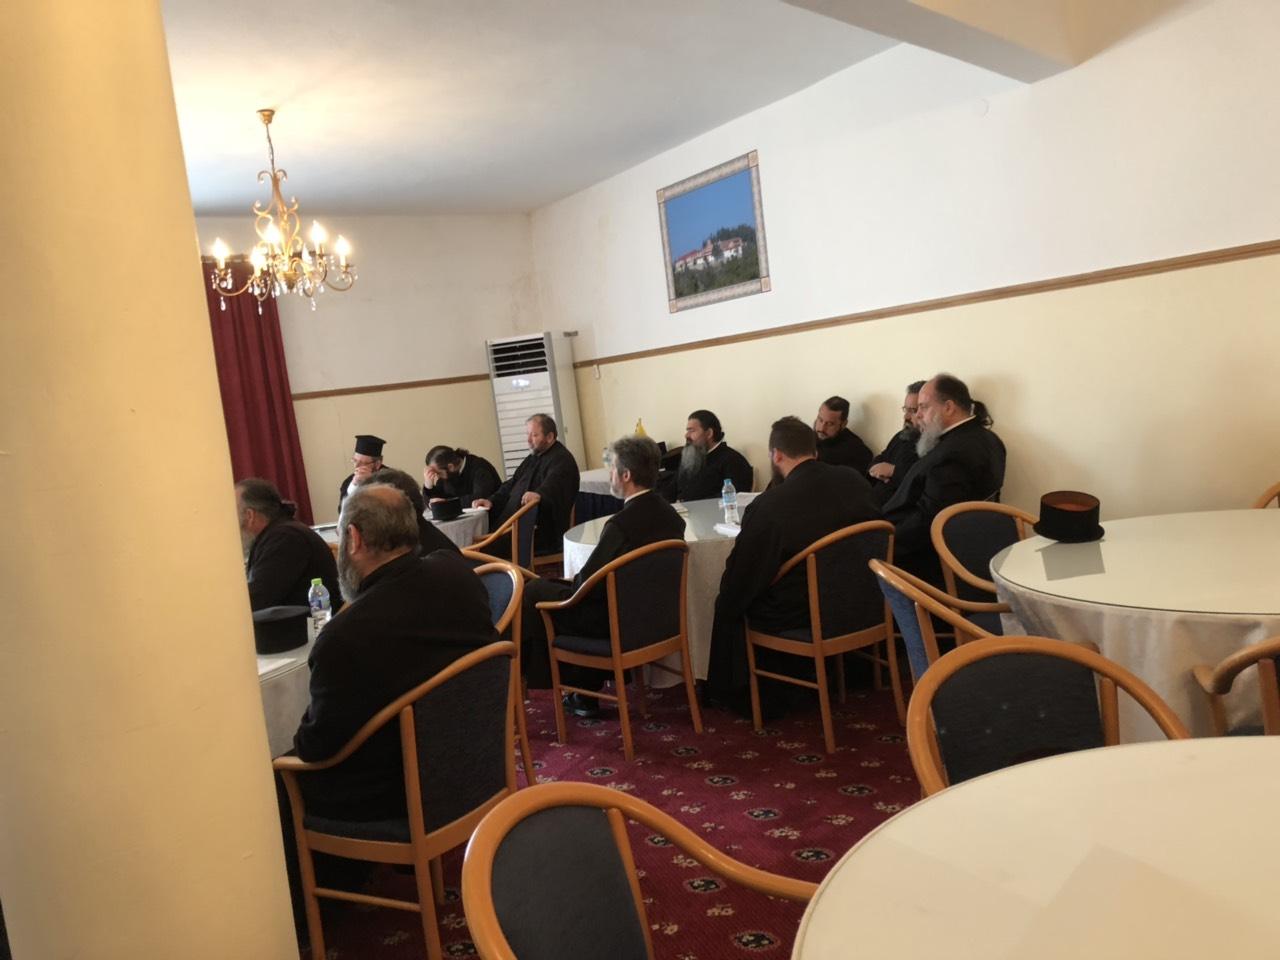 seminario elassona 3 - Ο Σεβασμιώτατος Ομιλητής Σε Επιμορφωτικό Σεμιναριο Στην Ιερά Μητρόπολη Ελασσώνος